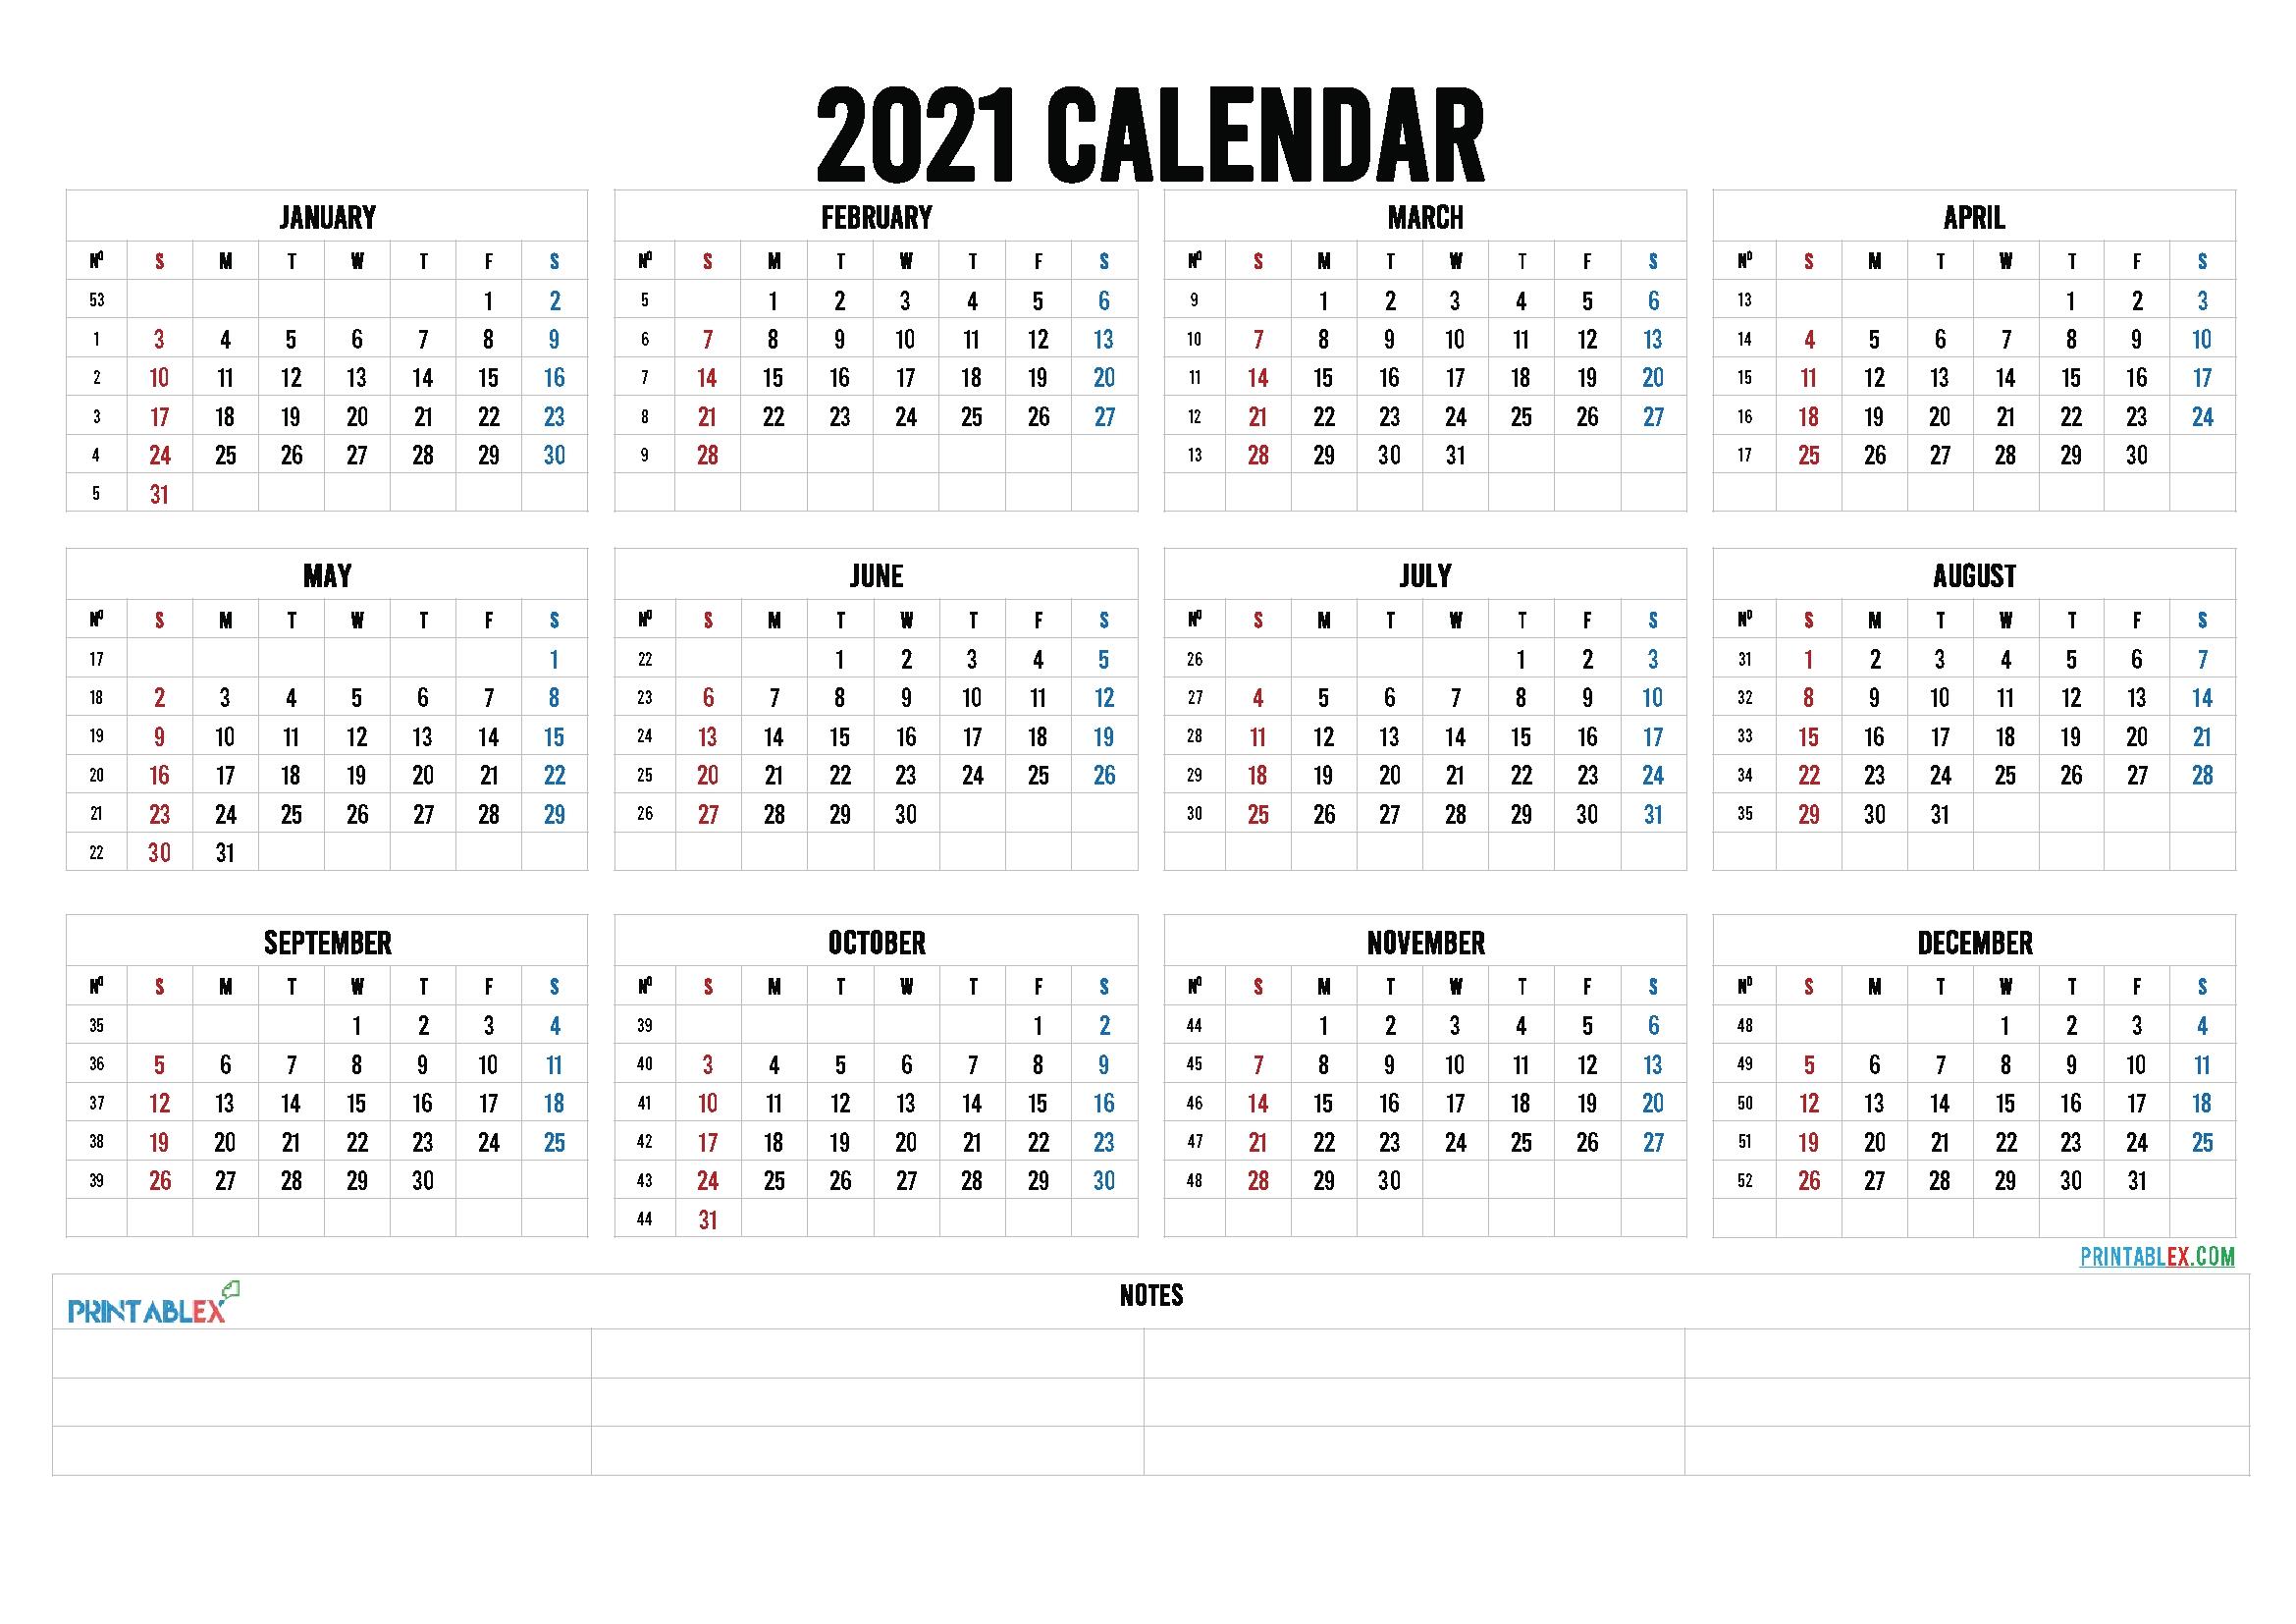 Free Editable Weekly 2021 Calendar : Custom Editable 2021 Free Printable Calendars Sarah Titus with regard to 2021 Yearly Calendar Template Printable